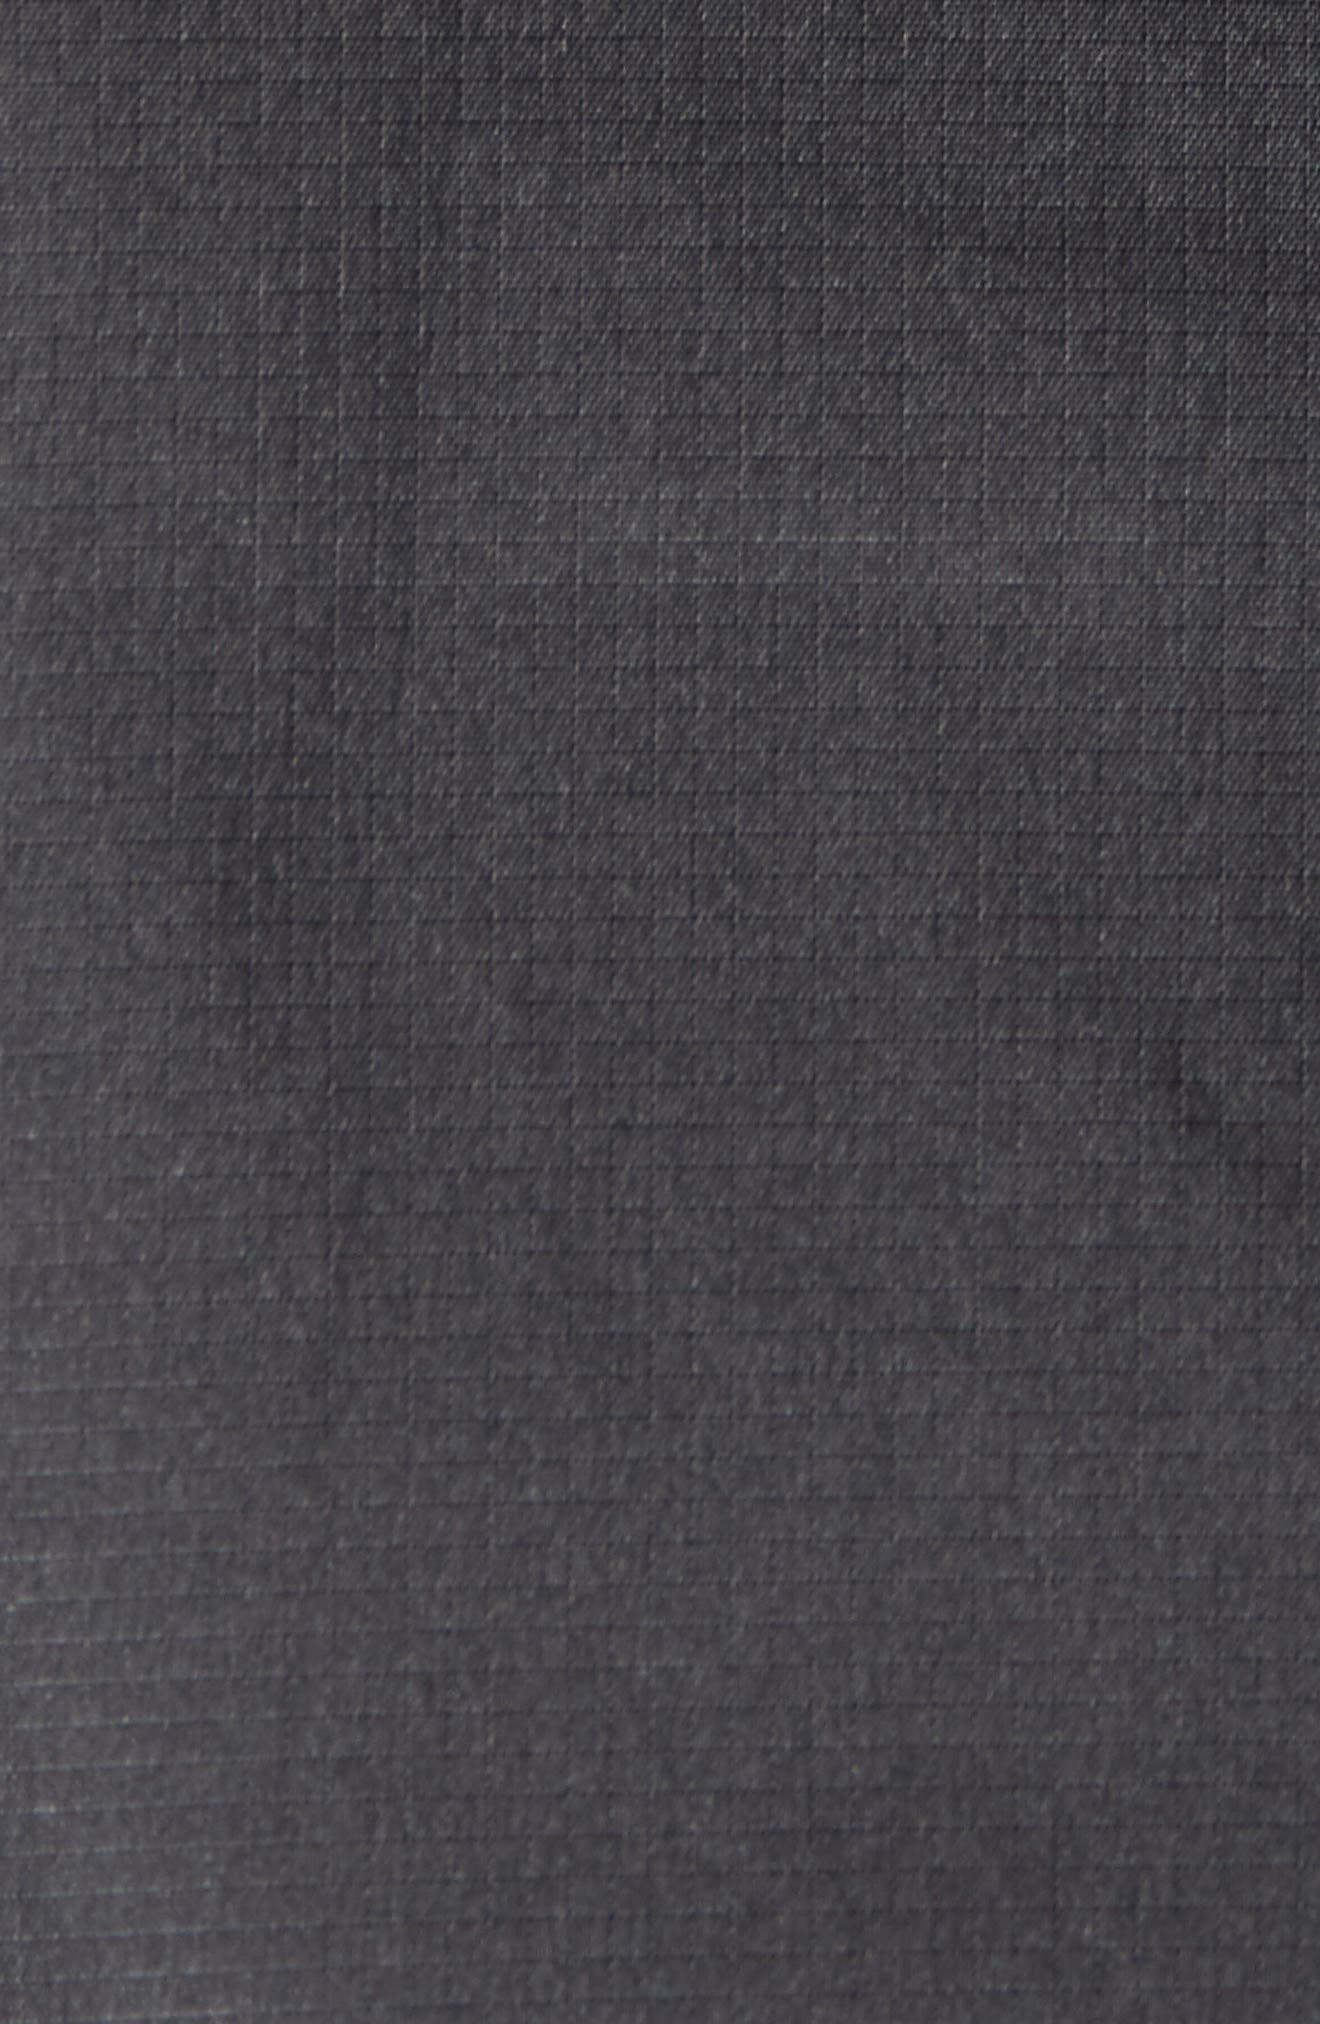 Fanorak Pullover,                             Alternate thumbnail 7, color,                             TNF BLACK